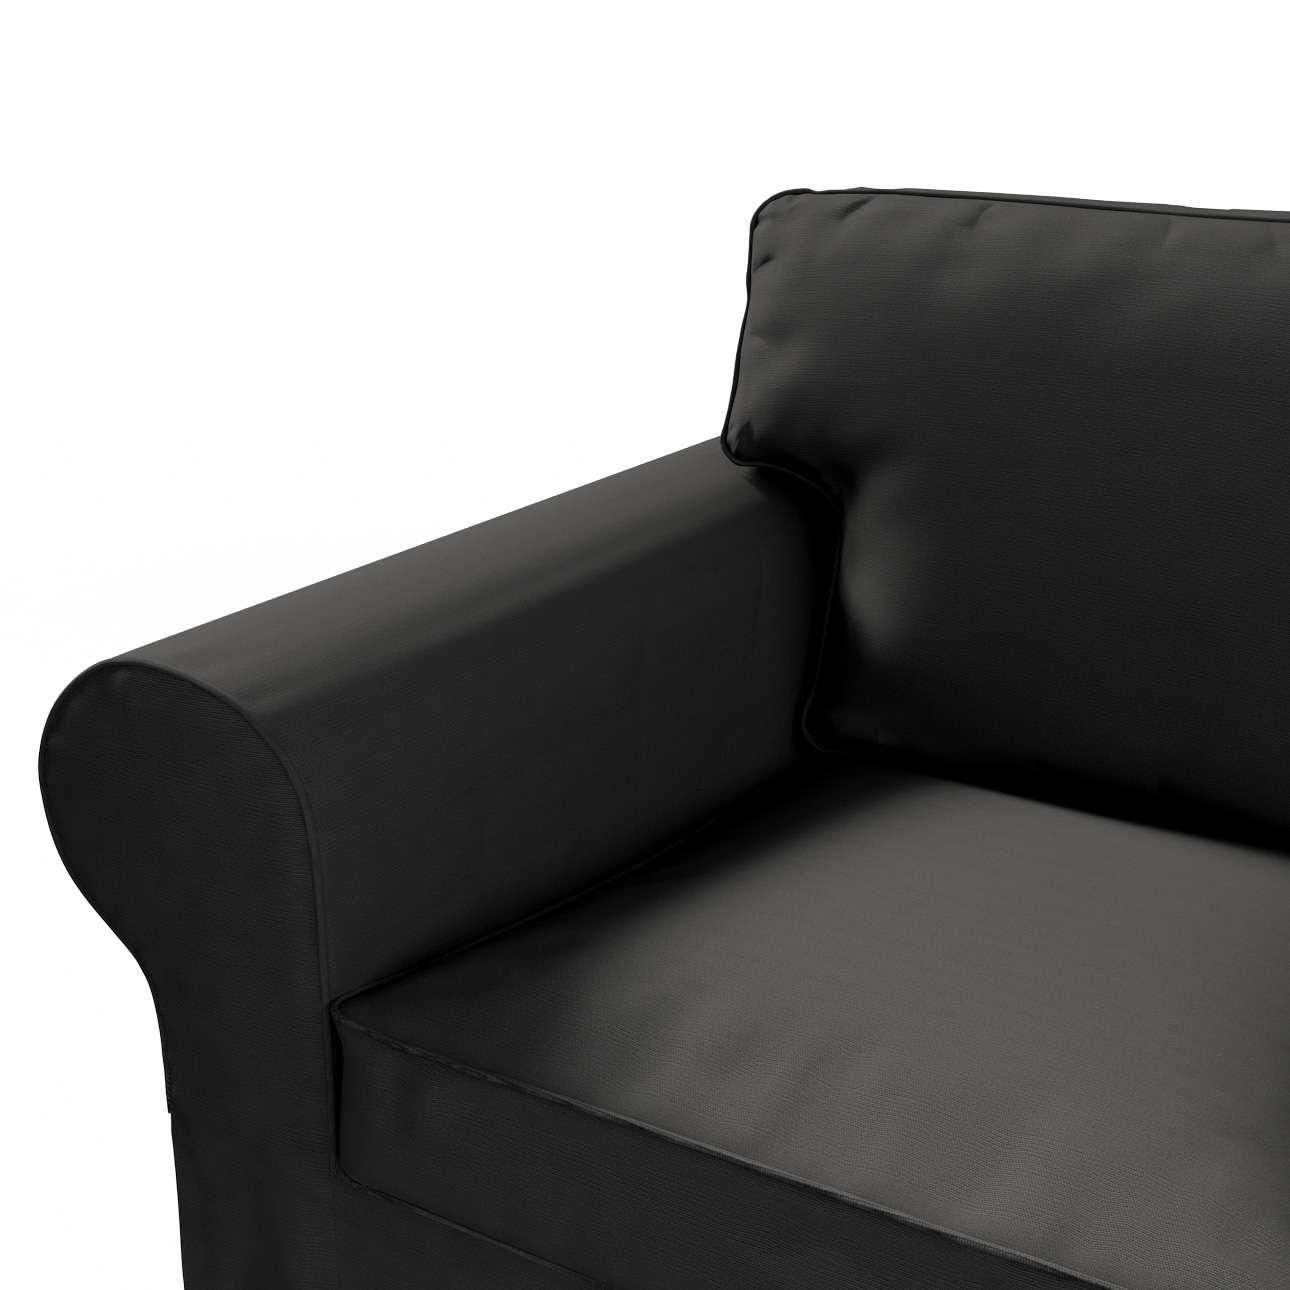 Ektorp 2 sæder sovesofa fra 2012<br/>Bredde ca 200cm fra kollektionen Cotton Panama, Stof: 702-08